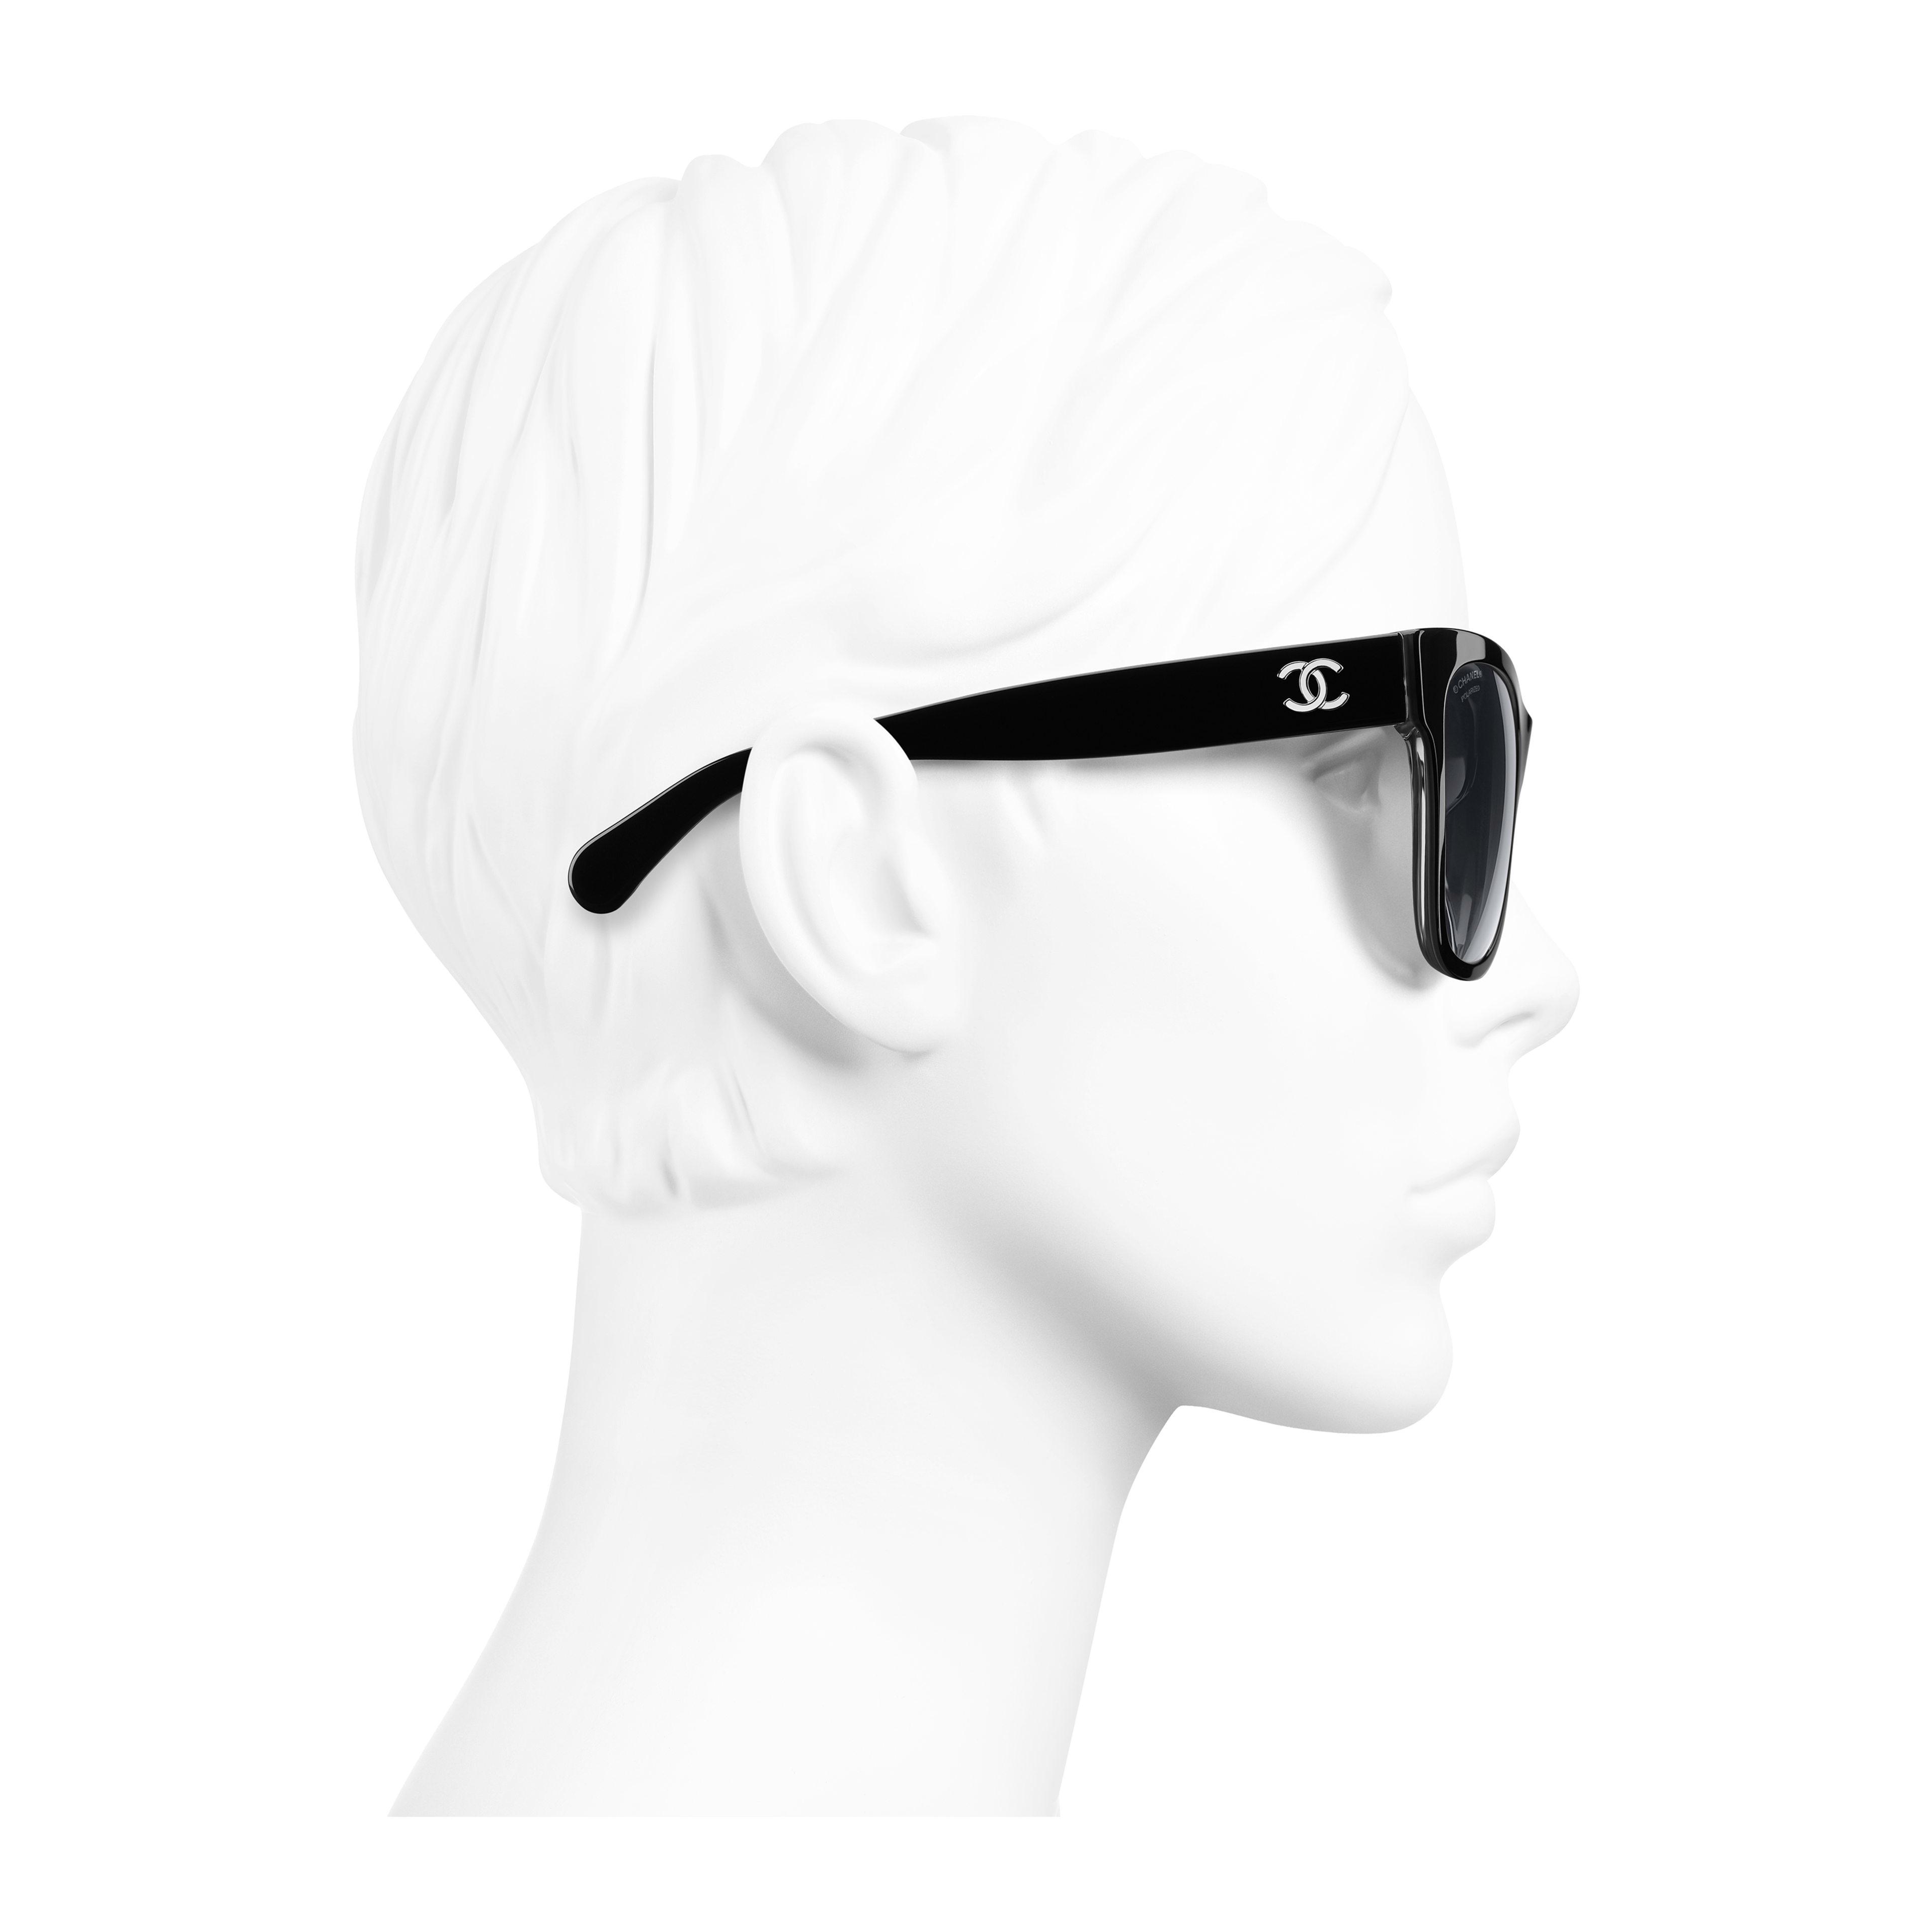 Square Sunglasses Acetate - Polarized Lenses Black - - see full sized version